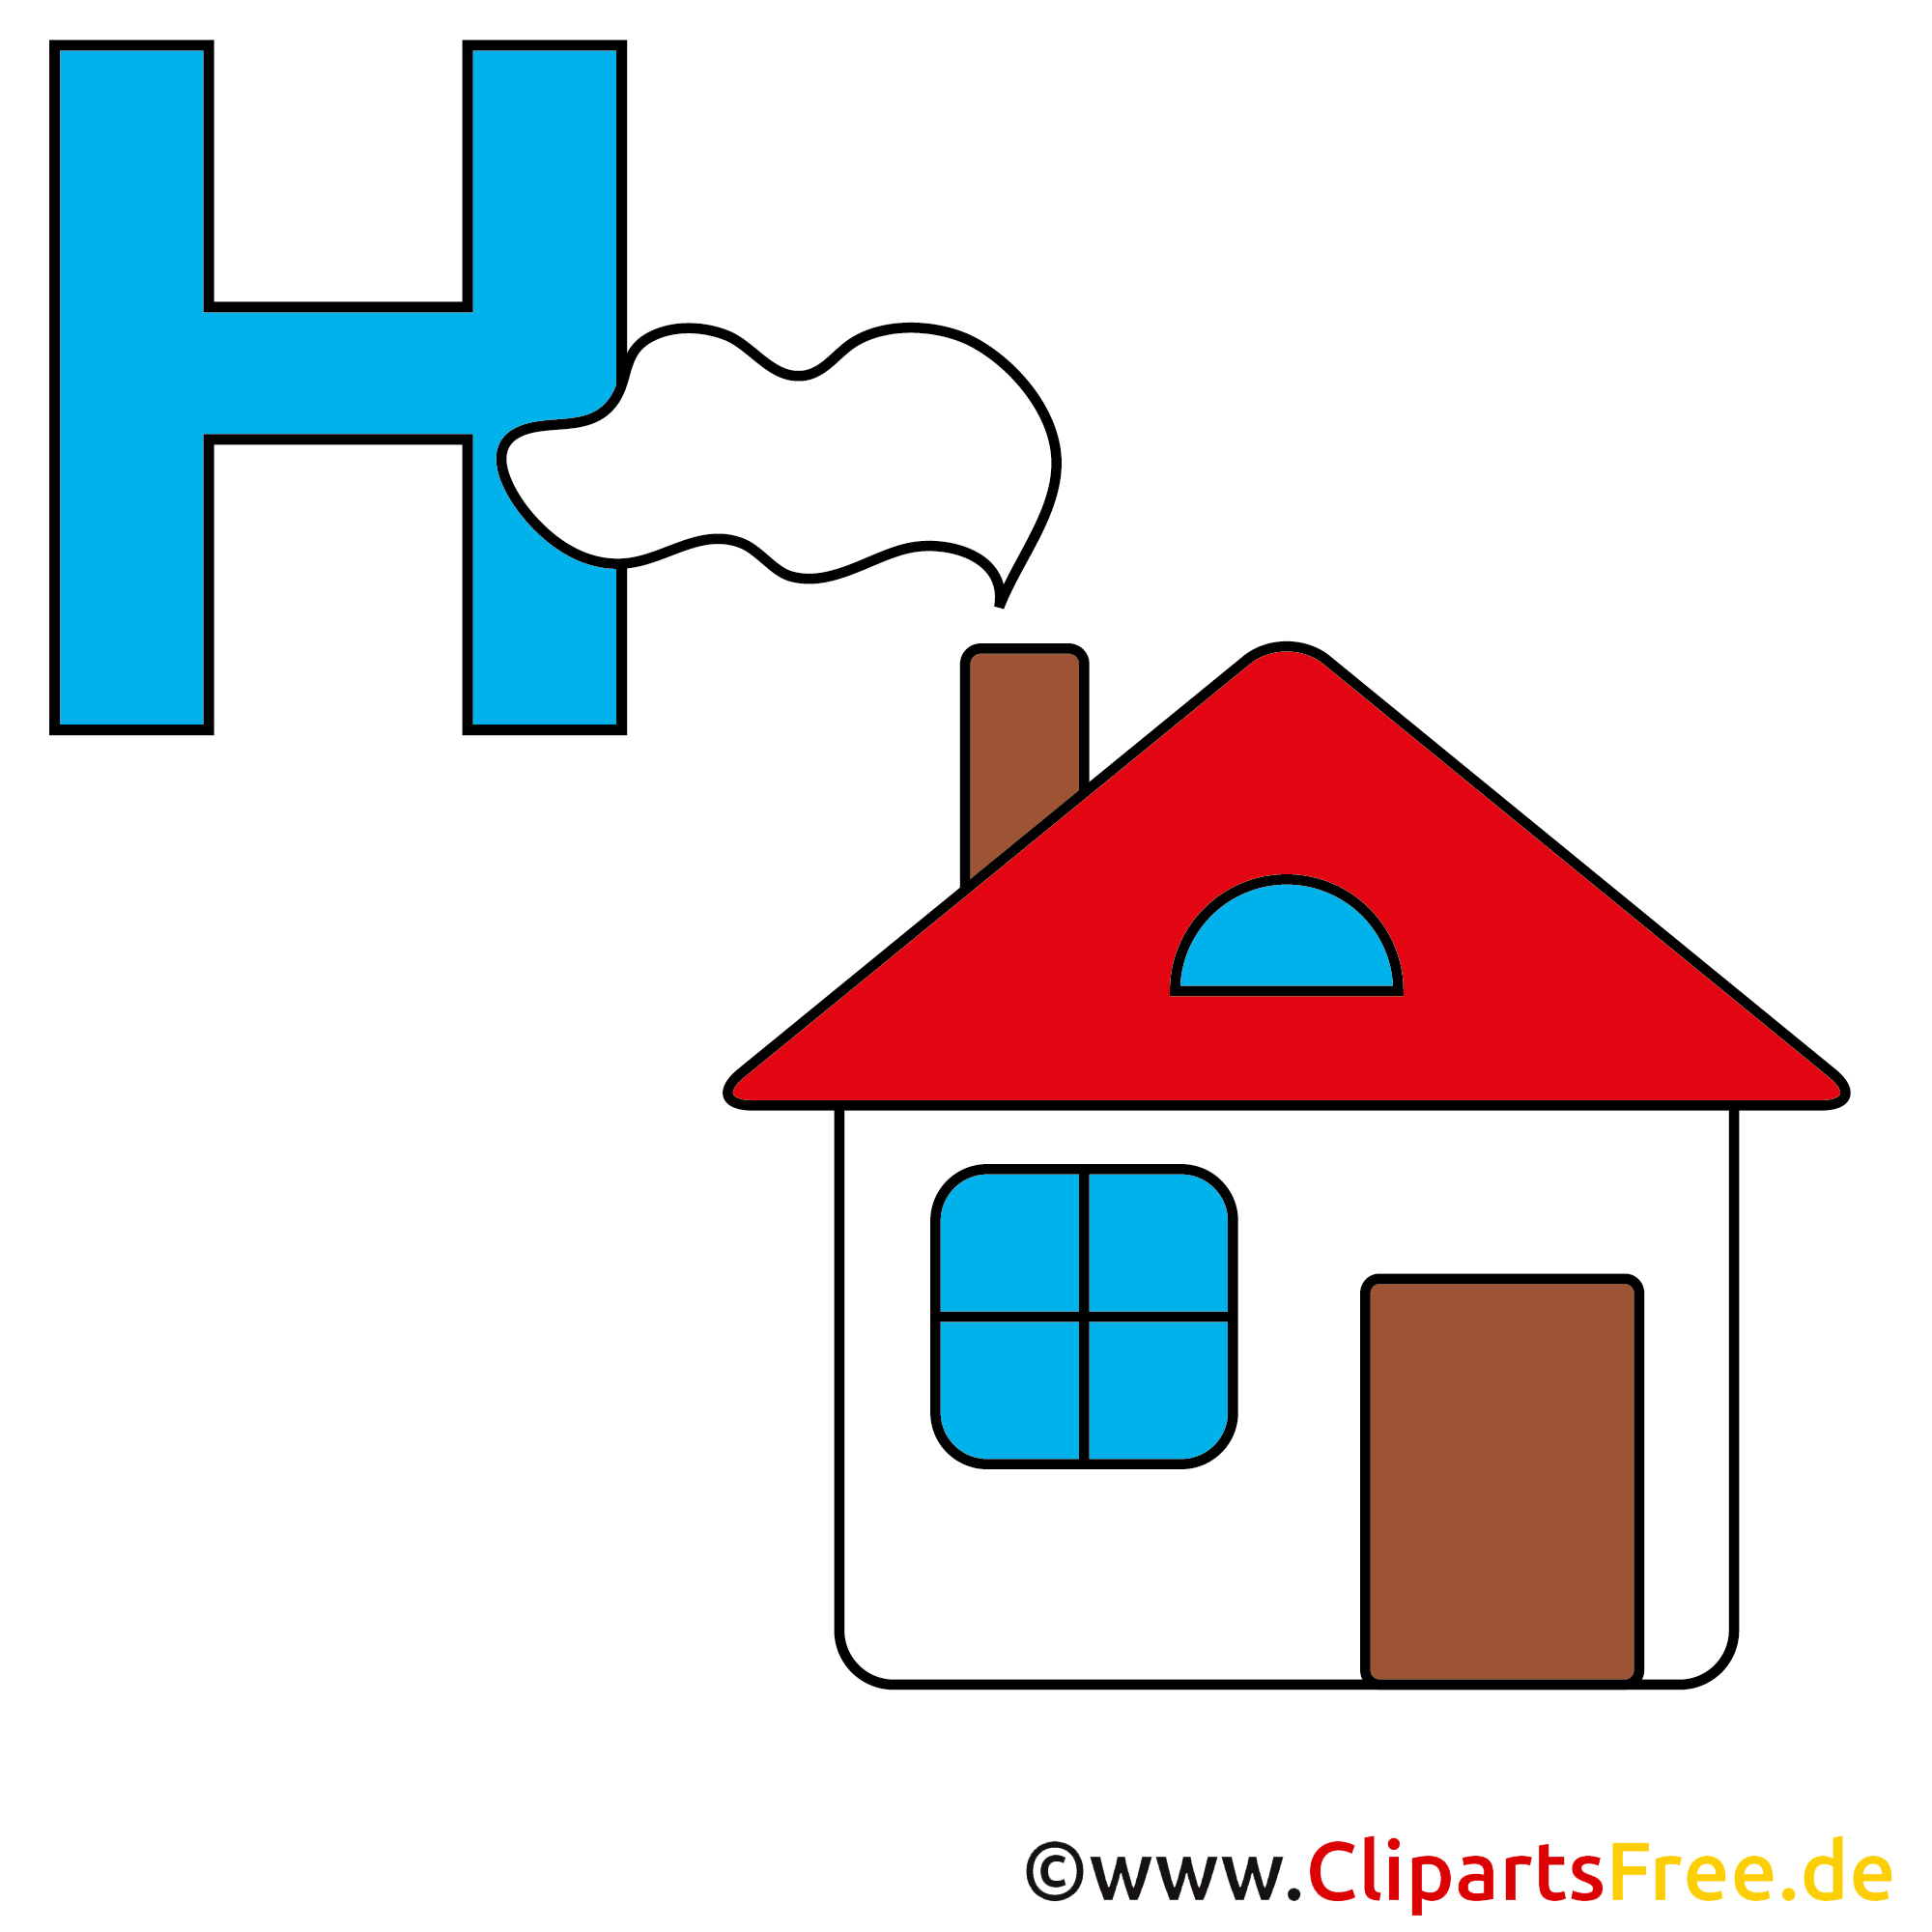 clipart haus - photo #12